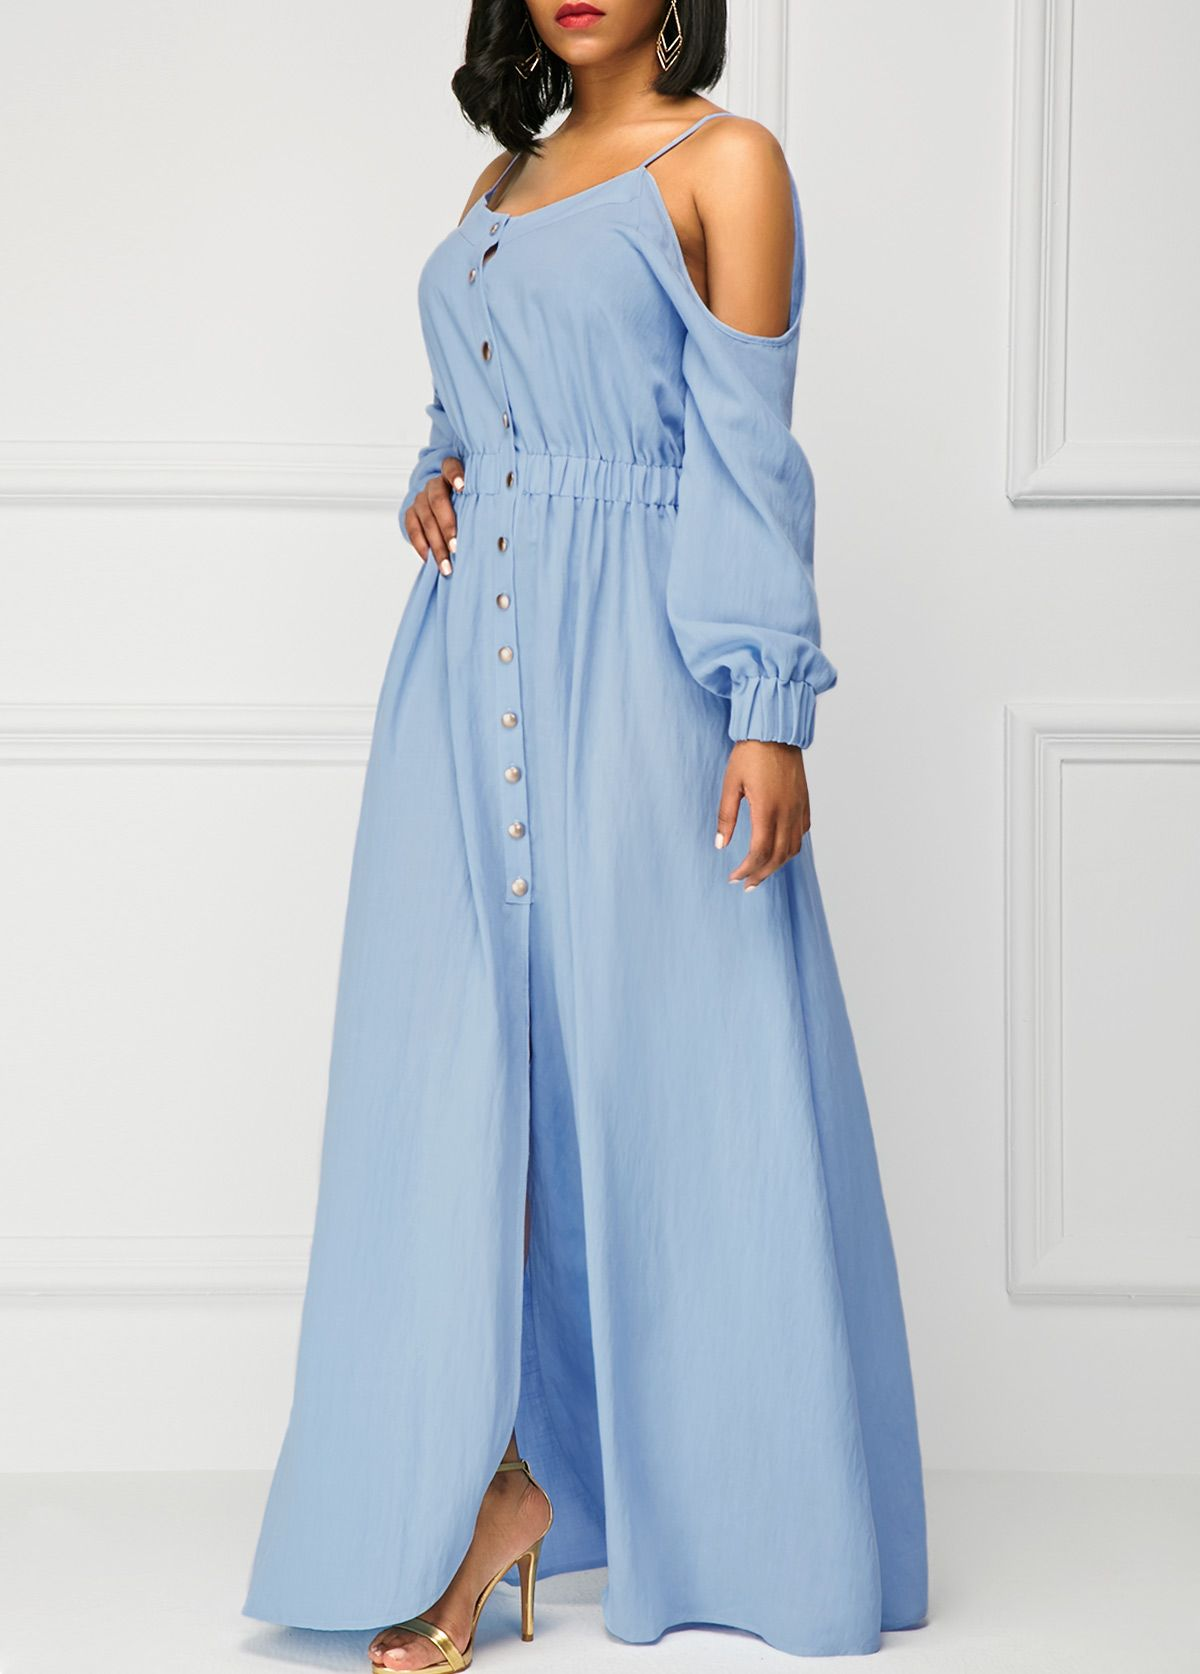 Off the shoulder blue long sleeve maxi dress long sleeve maxi